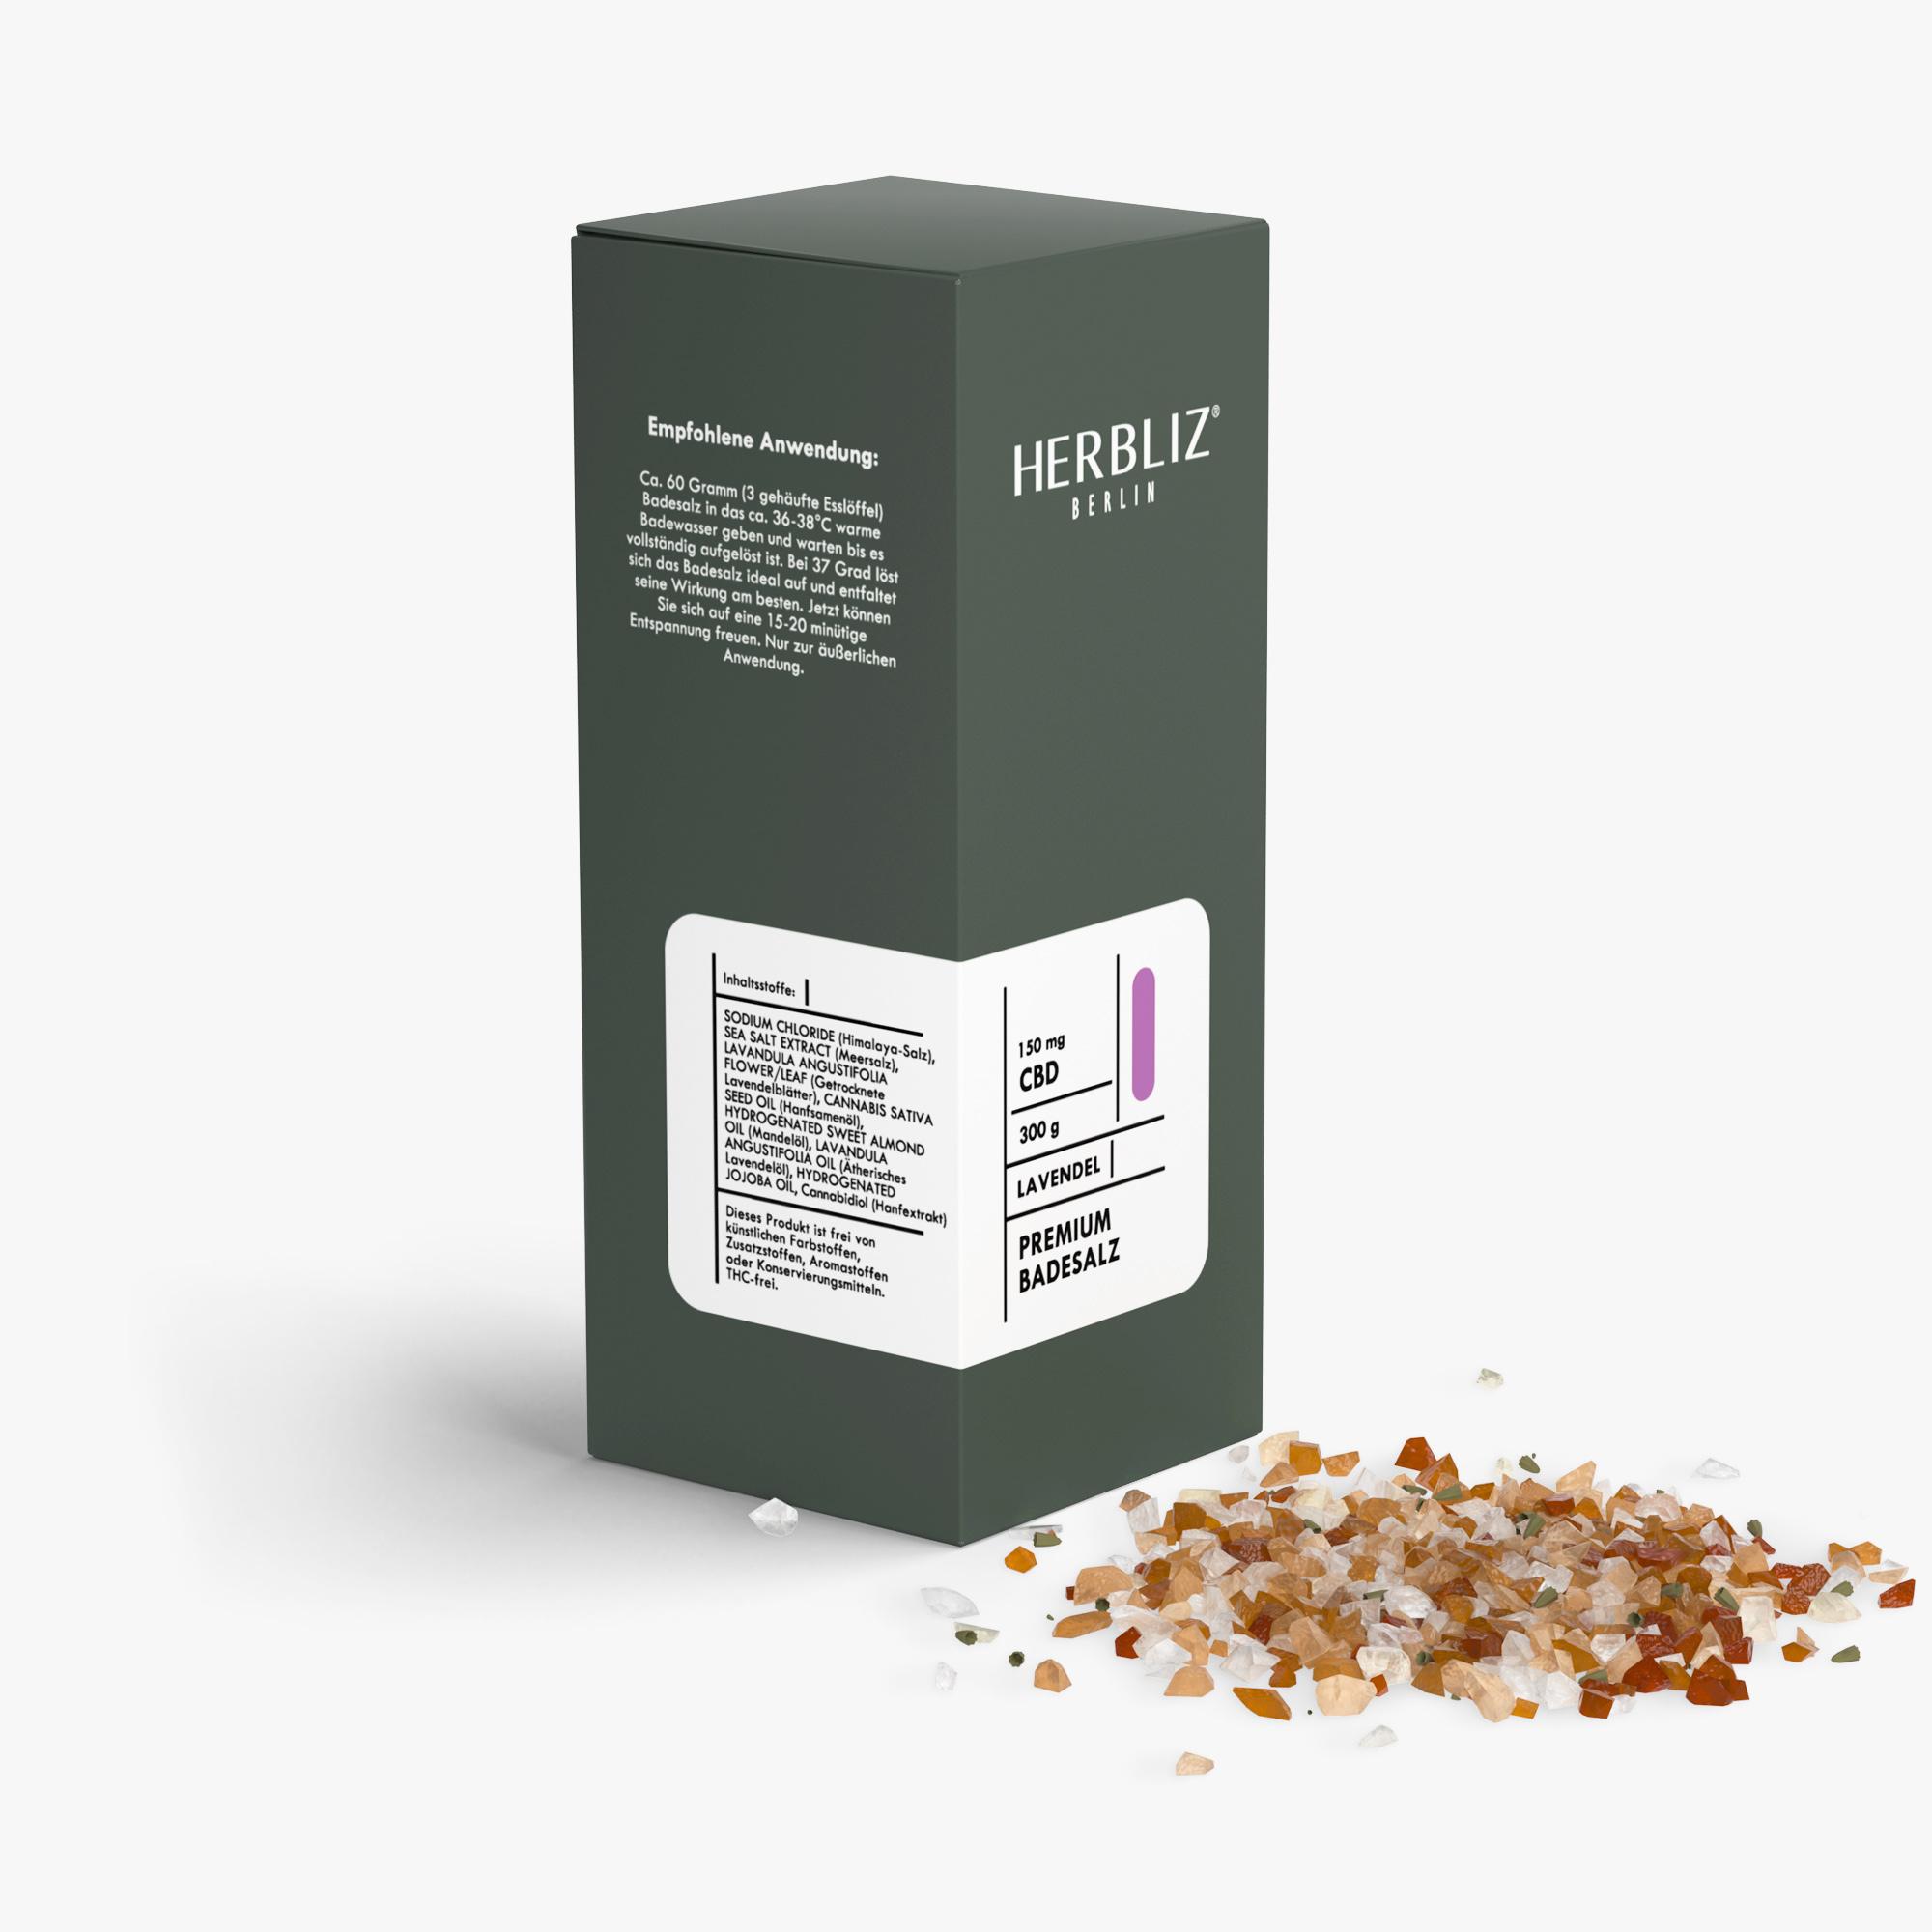 HERBLIZ CBD Badesalz - 4 Sorten - 150 mg - Lavendel